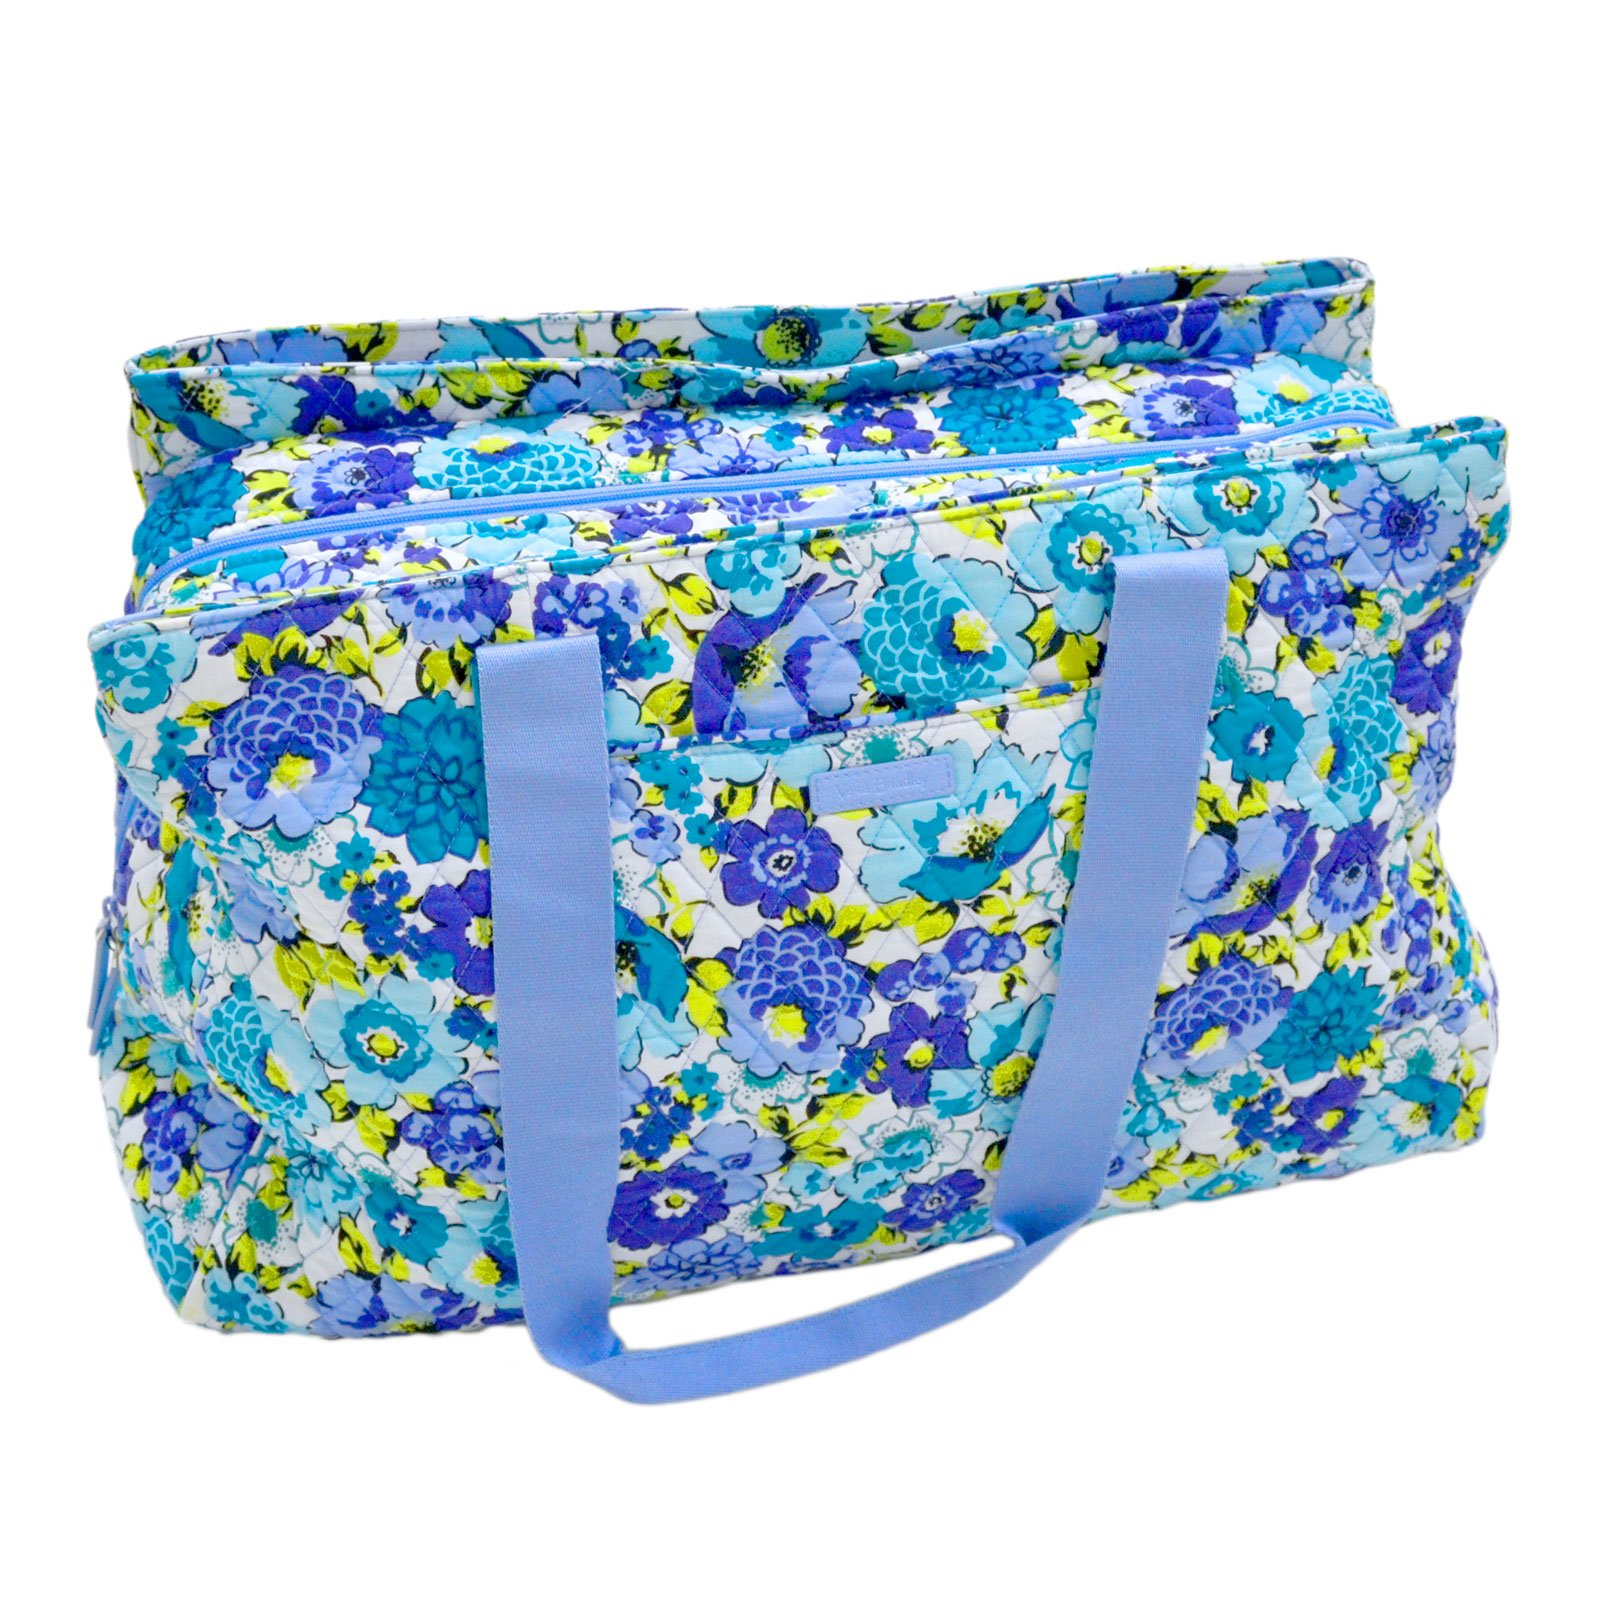 Vera Bradley Triple Compartment Travel Bag (Blueberry Blooms)